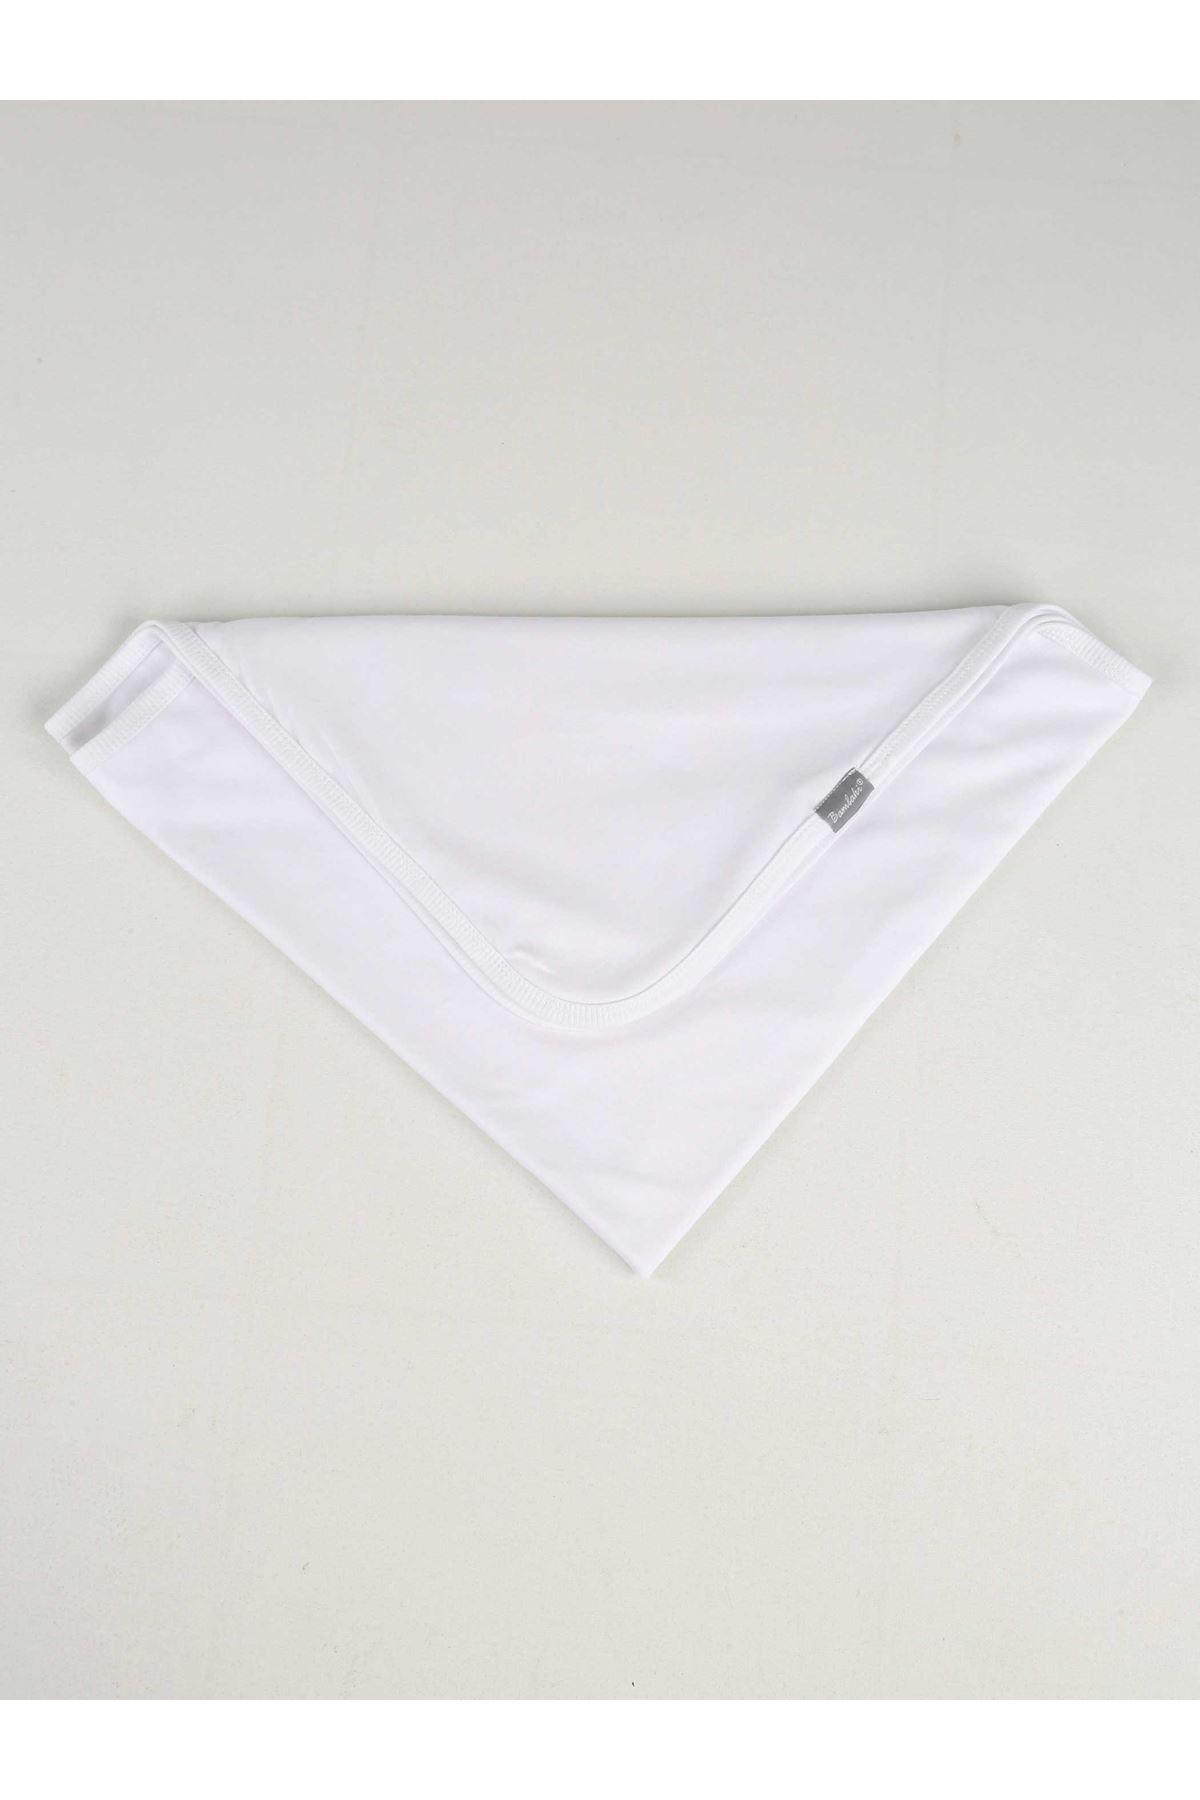 White Girl Boy Newborn Baby Blanket Cotton Soft Seasonal Plain Comfortable Babies 85X85 cm